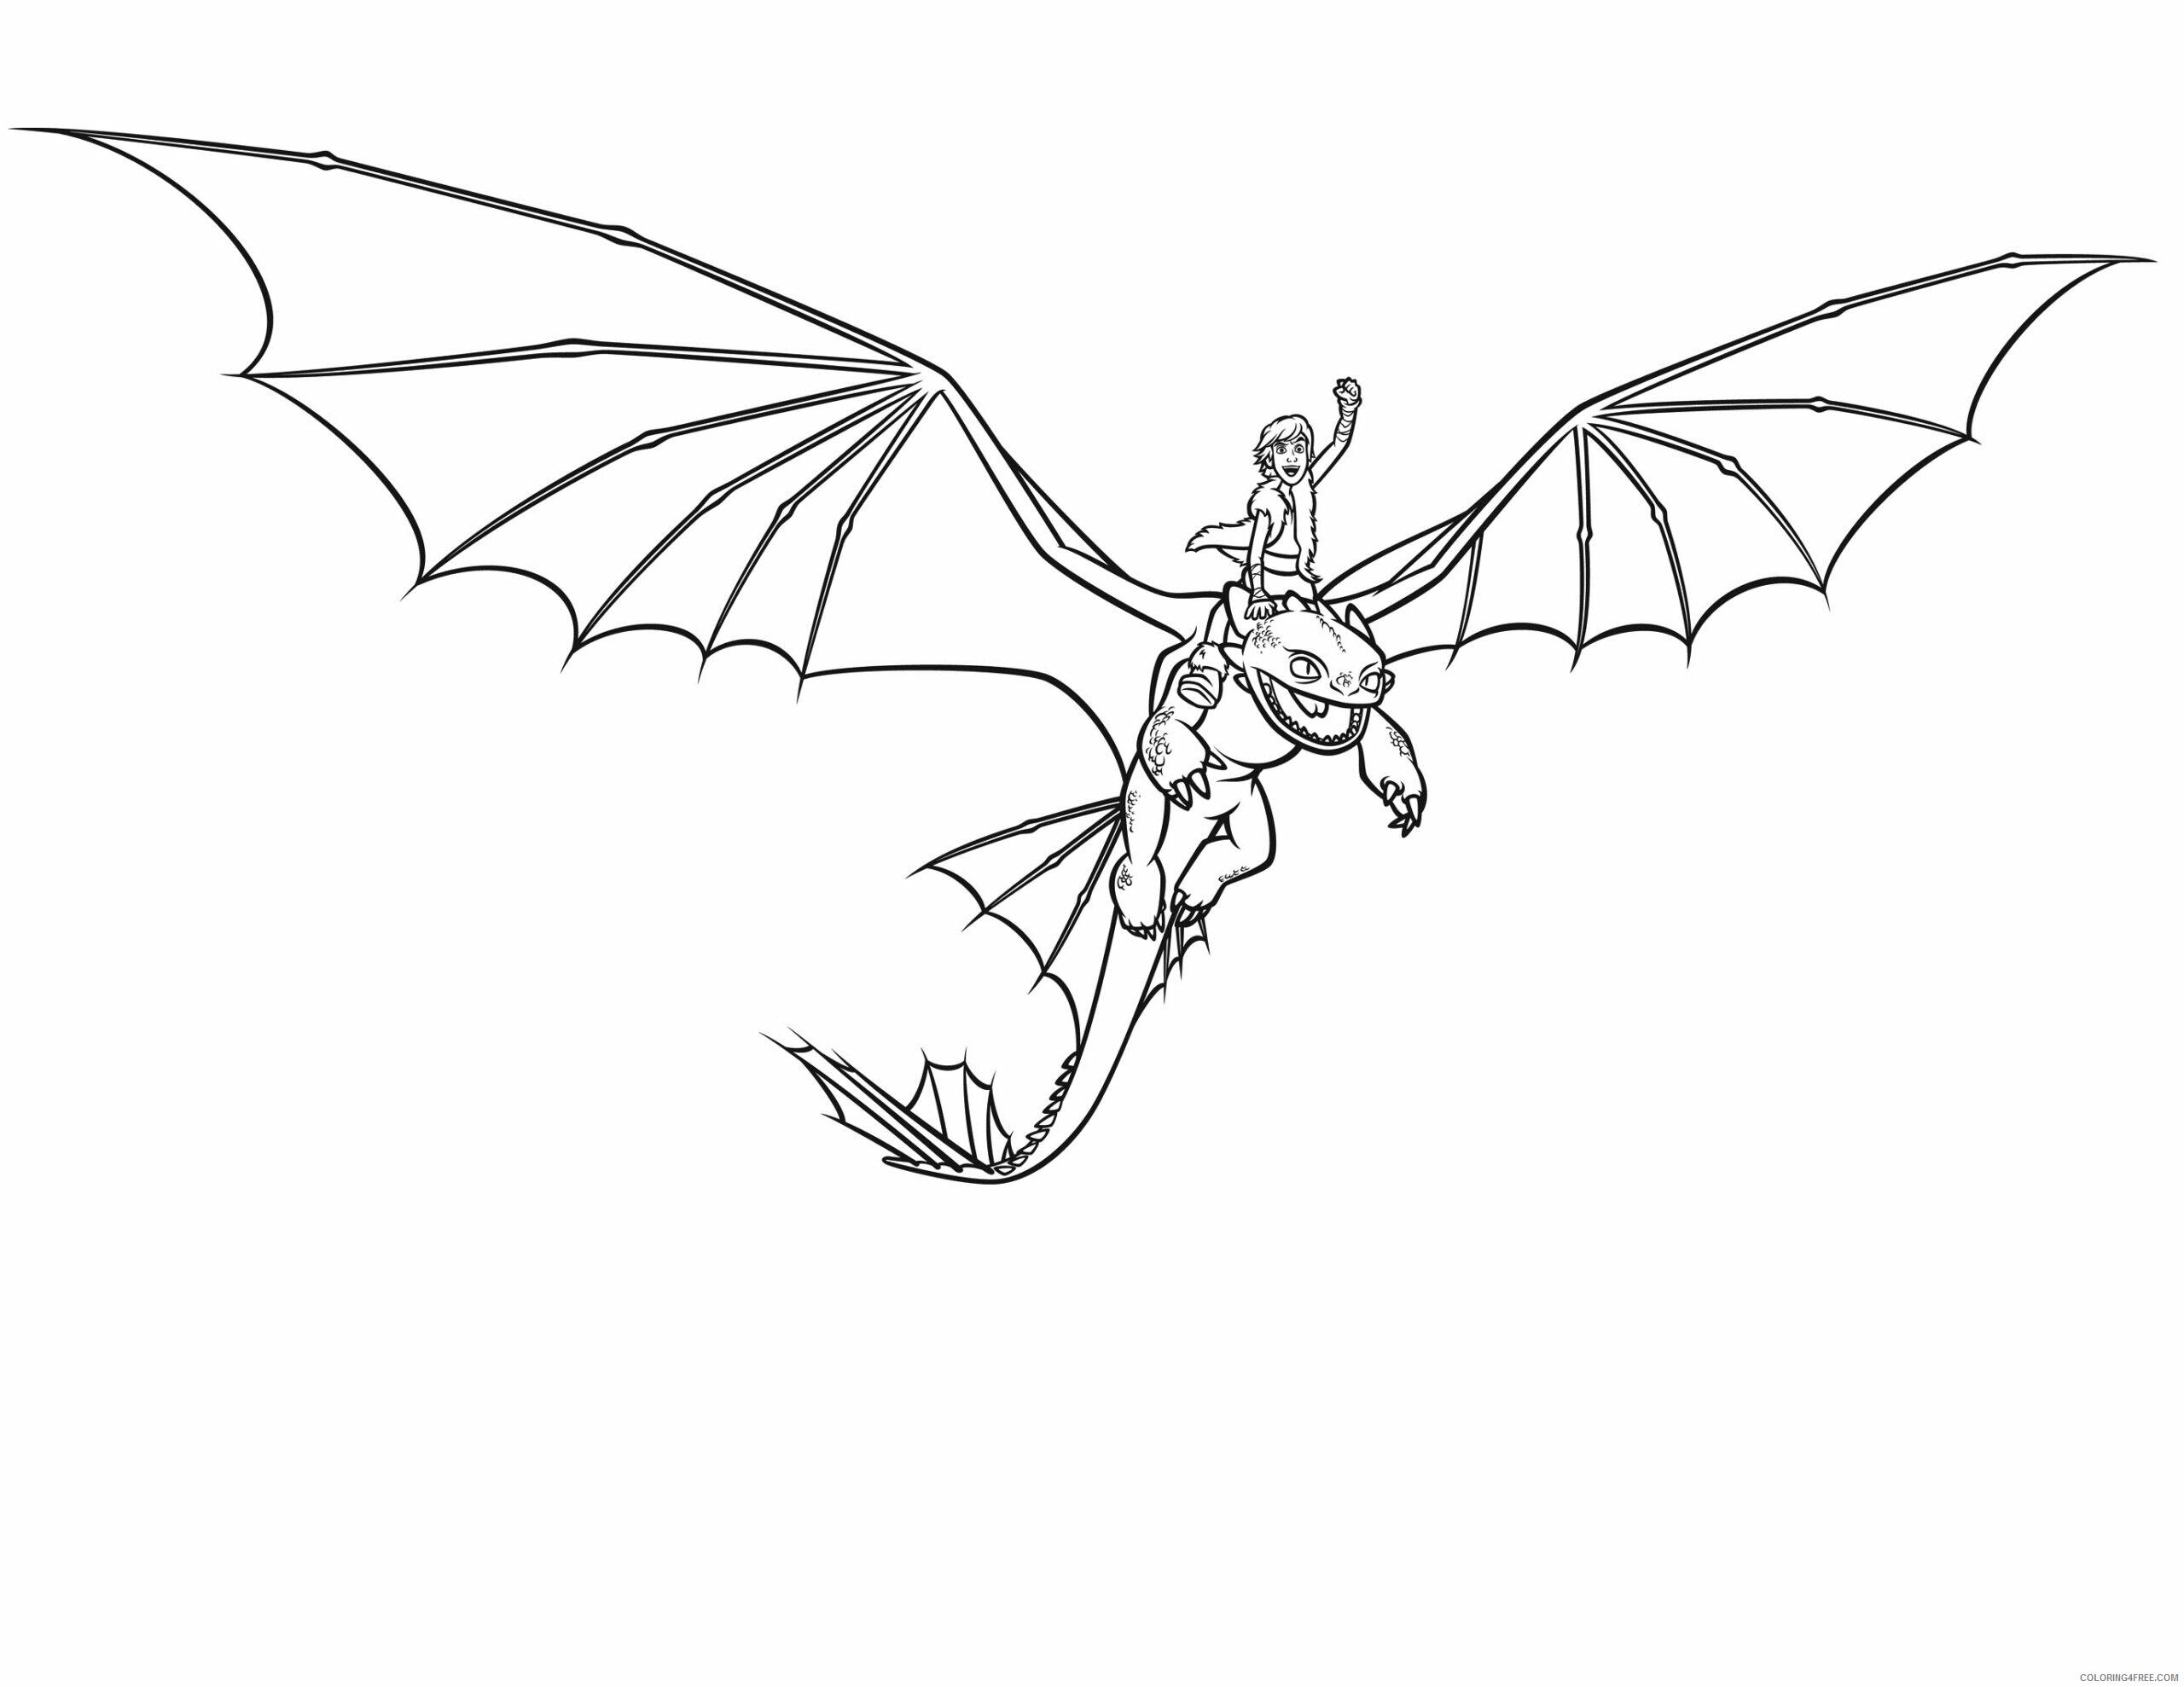 Fantasy Dragons Coloring Pages Dragon to Print Printable 2021 2580 Coloring4free